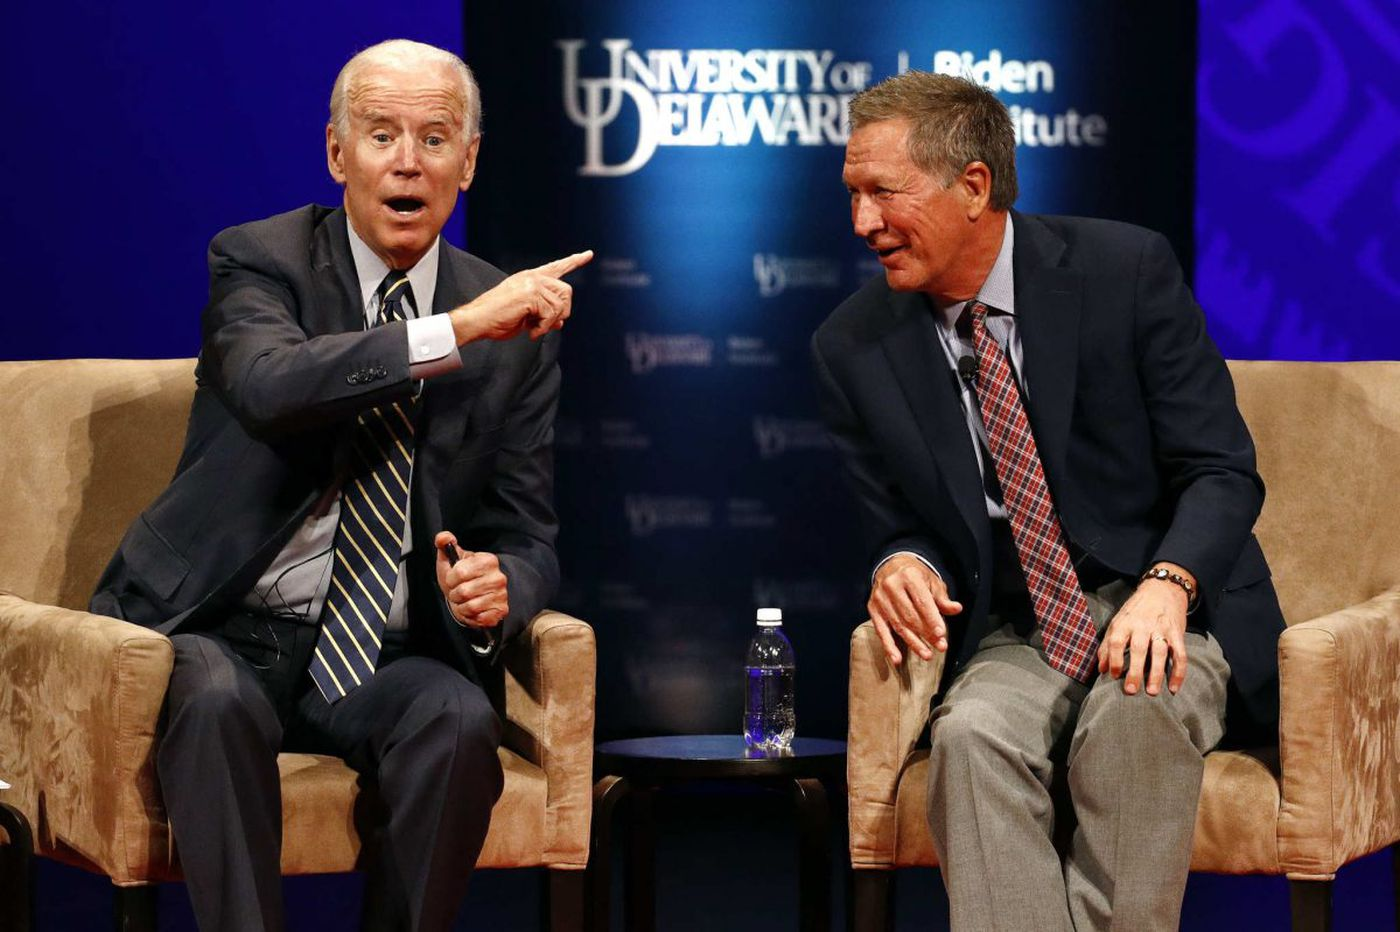 John Kasich, Joe Biden talk civility at UDel., stay silent on 2020